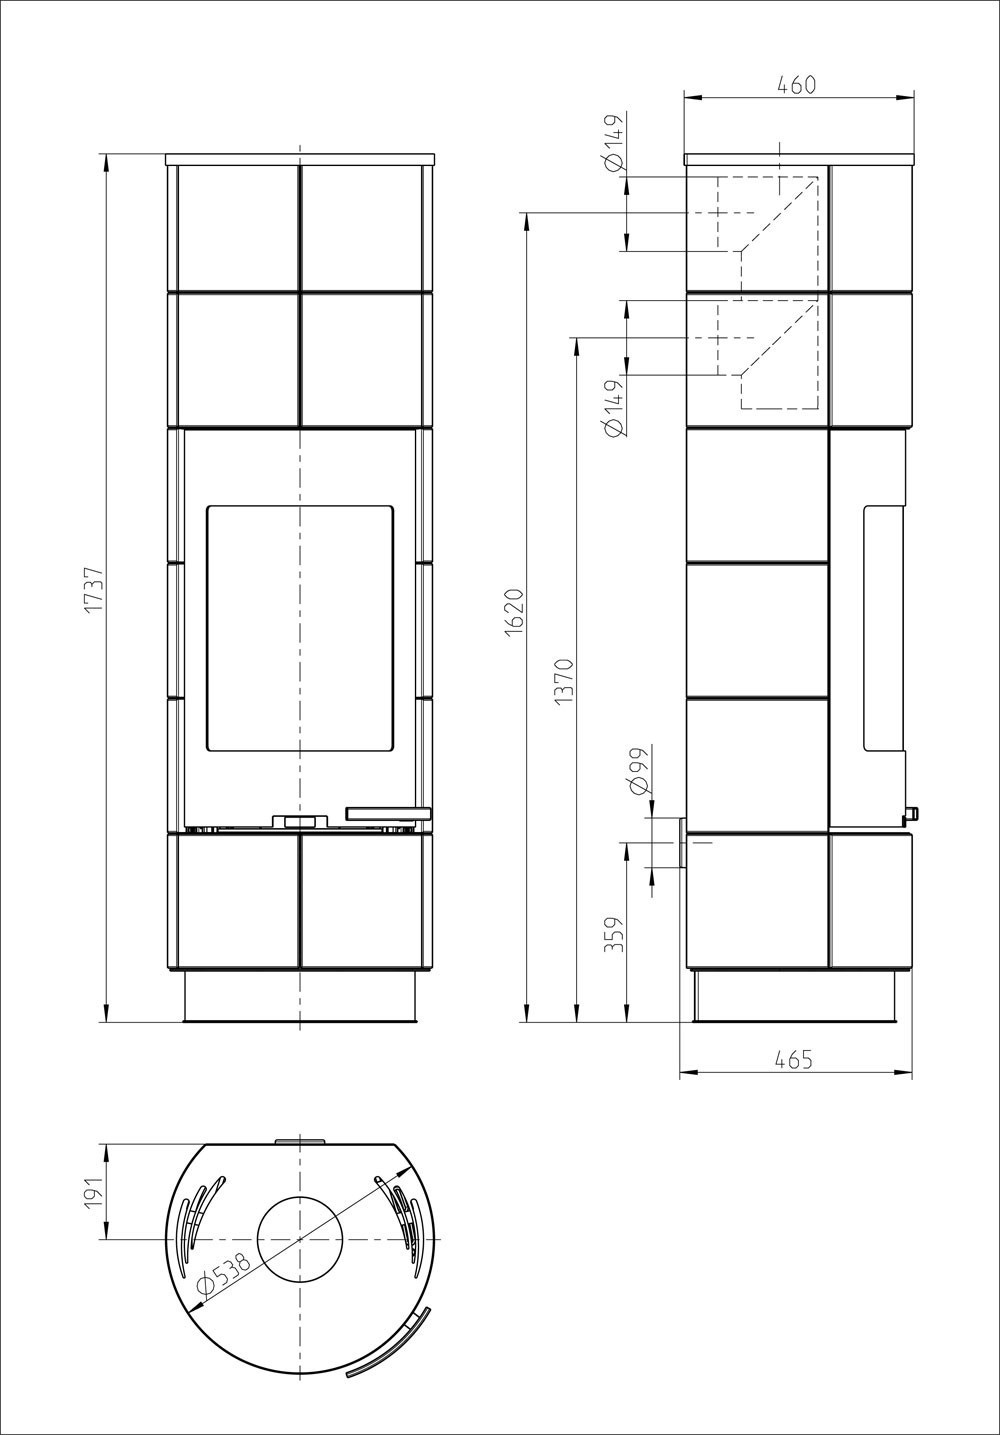 Kaminofen Thorma Delia / Cadiz Plus raumluftun. Serpentino schw. 7,5kW Bild 3